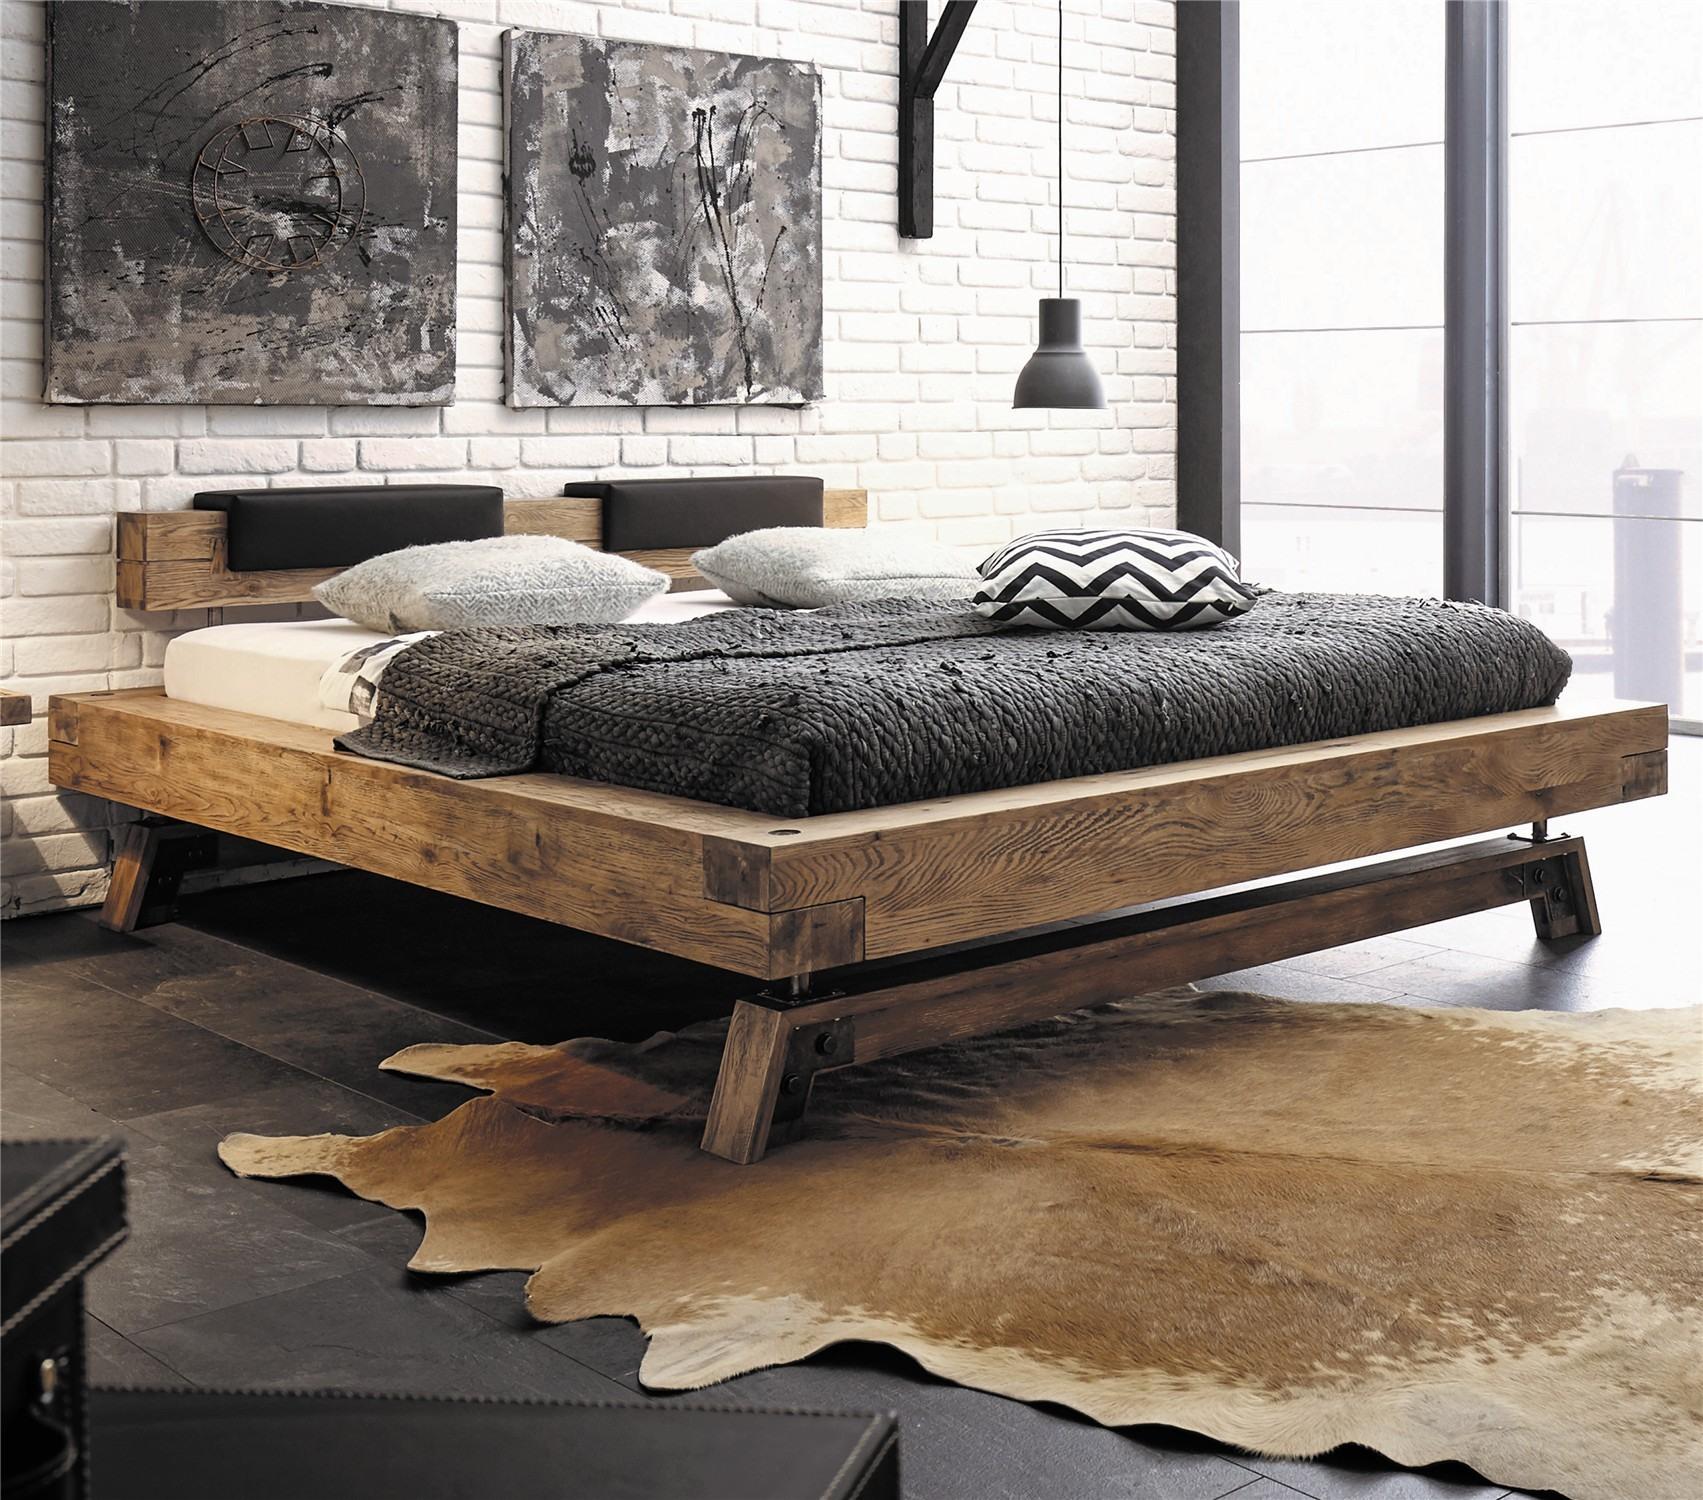 Full Size of Betten Holz Design Bett Metall 180x200 Mit Bettkasten 140x220 160x200 Lattenrost Tatami Boxspring Landhausstil Schlafzimmer Set Boxspringbett 80x200 Eiche Bett Bett Holz